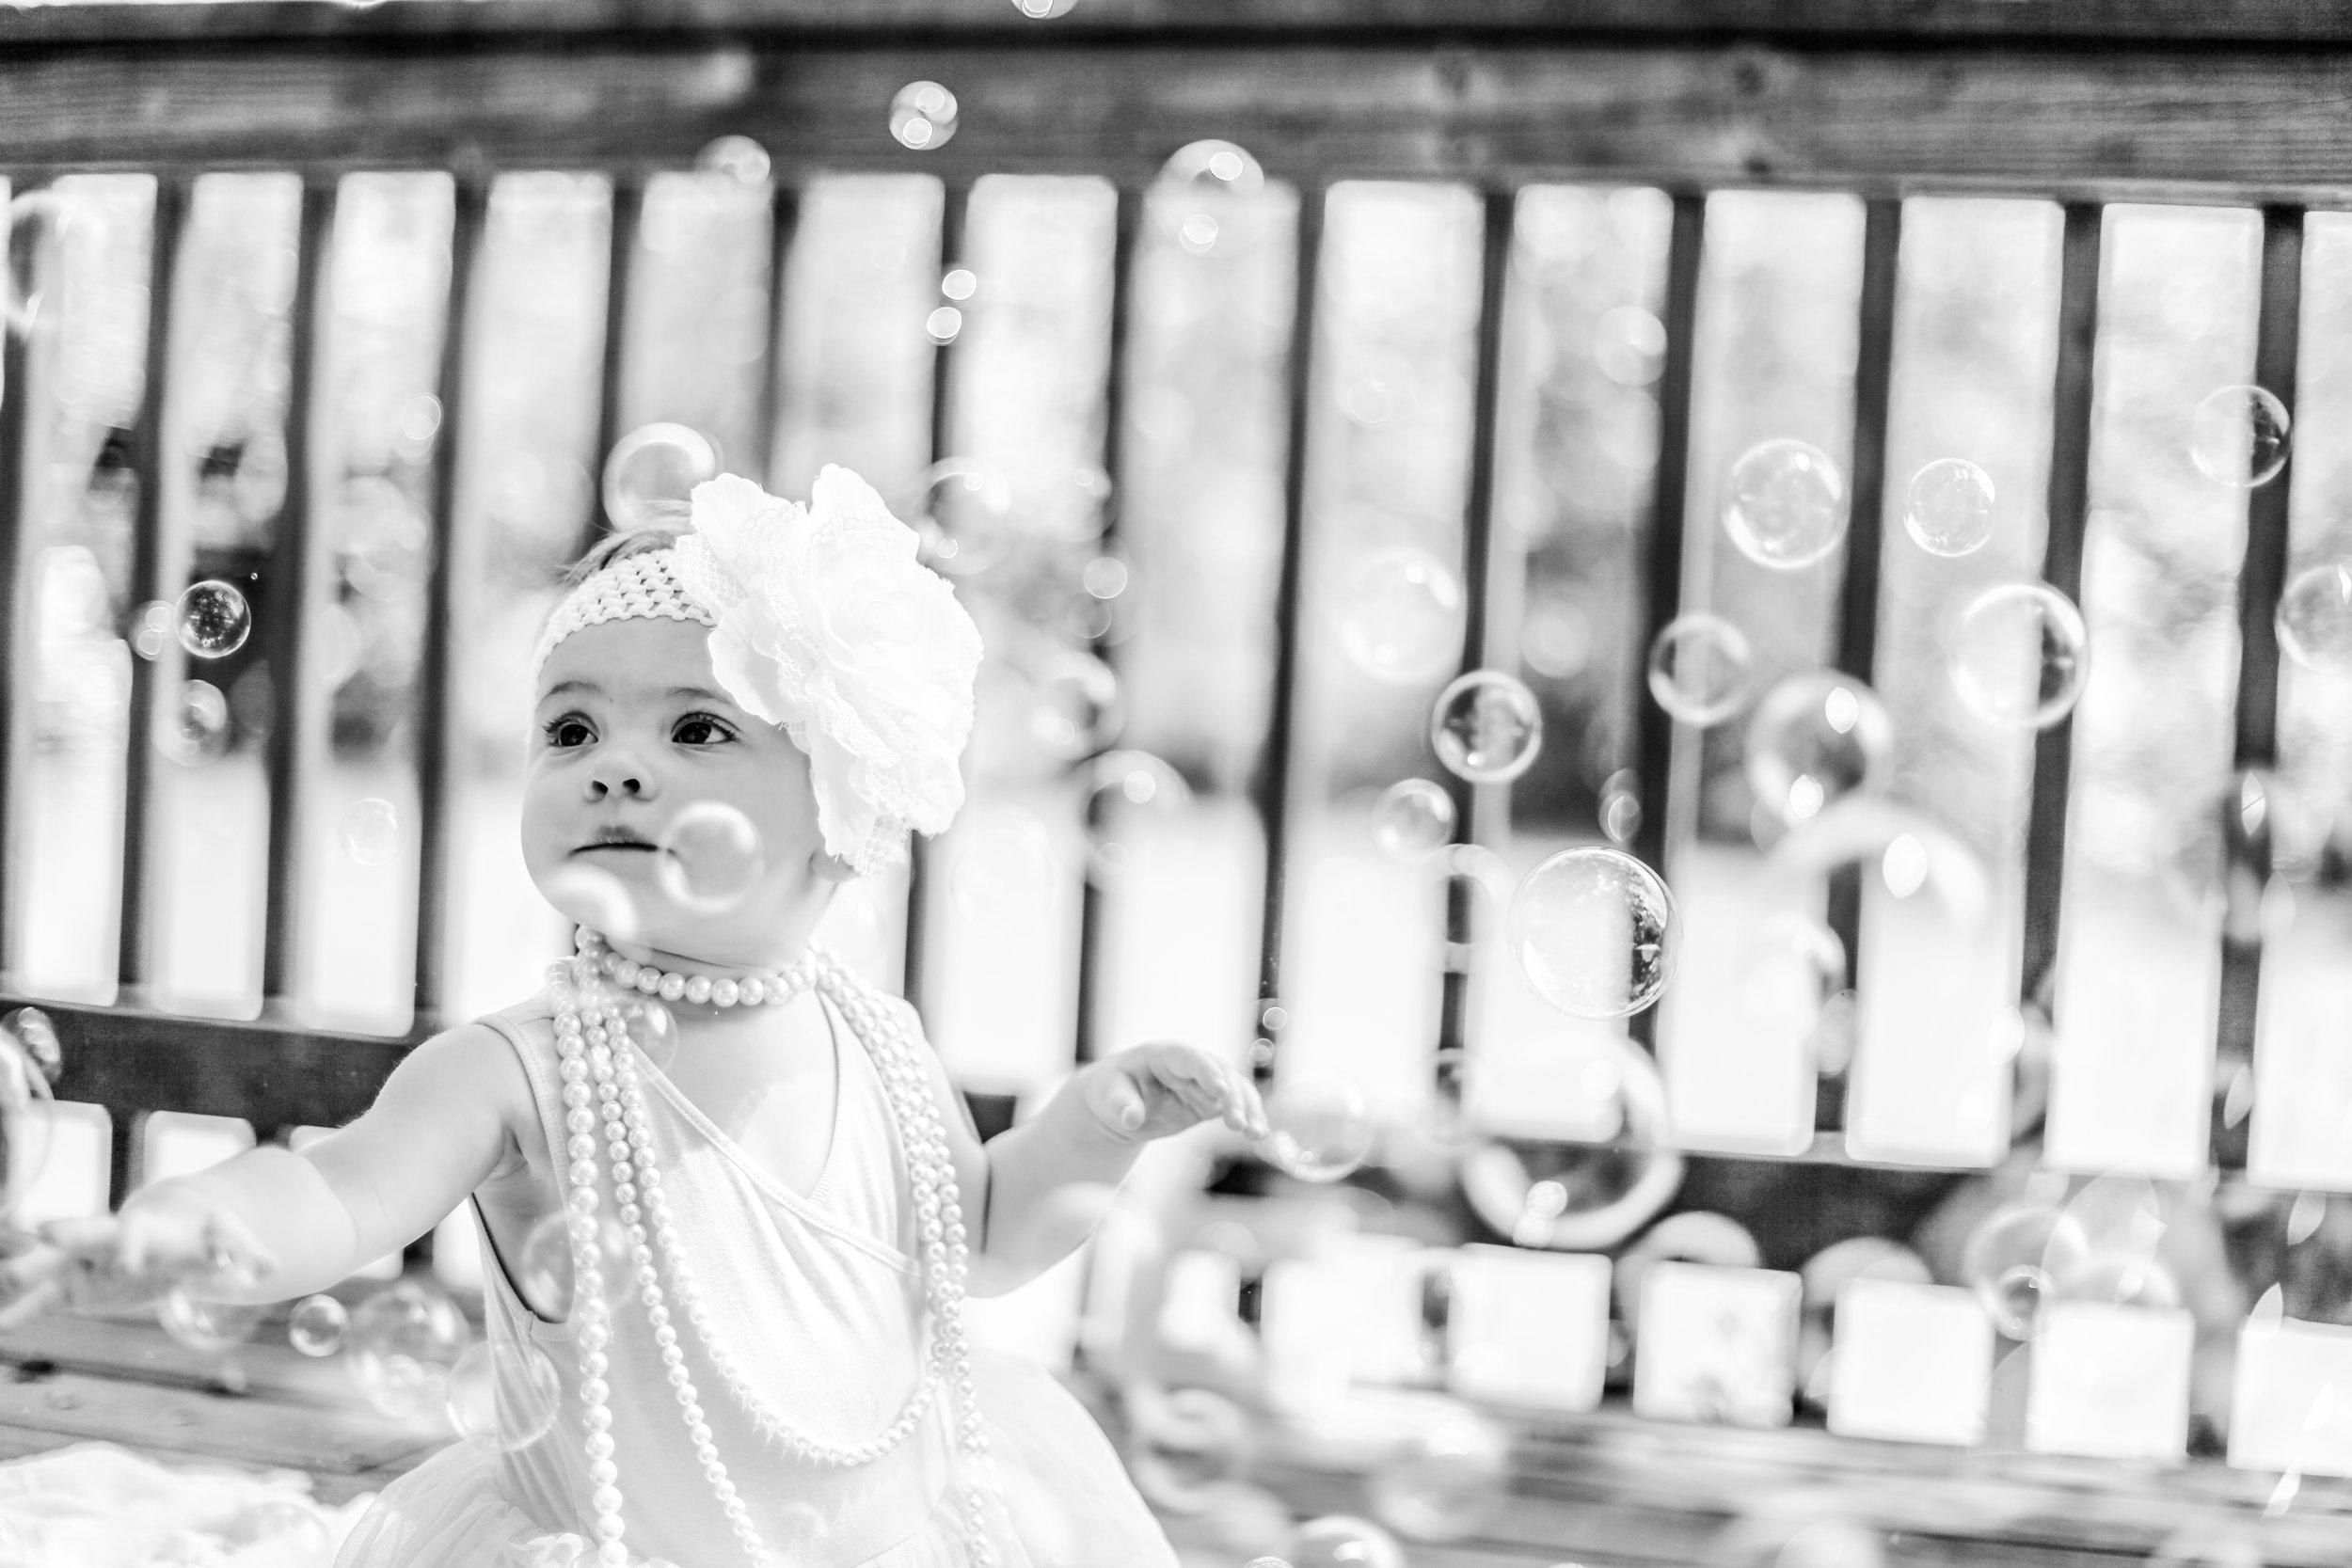 woodstock baby photography angela elliott-60.jpg